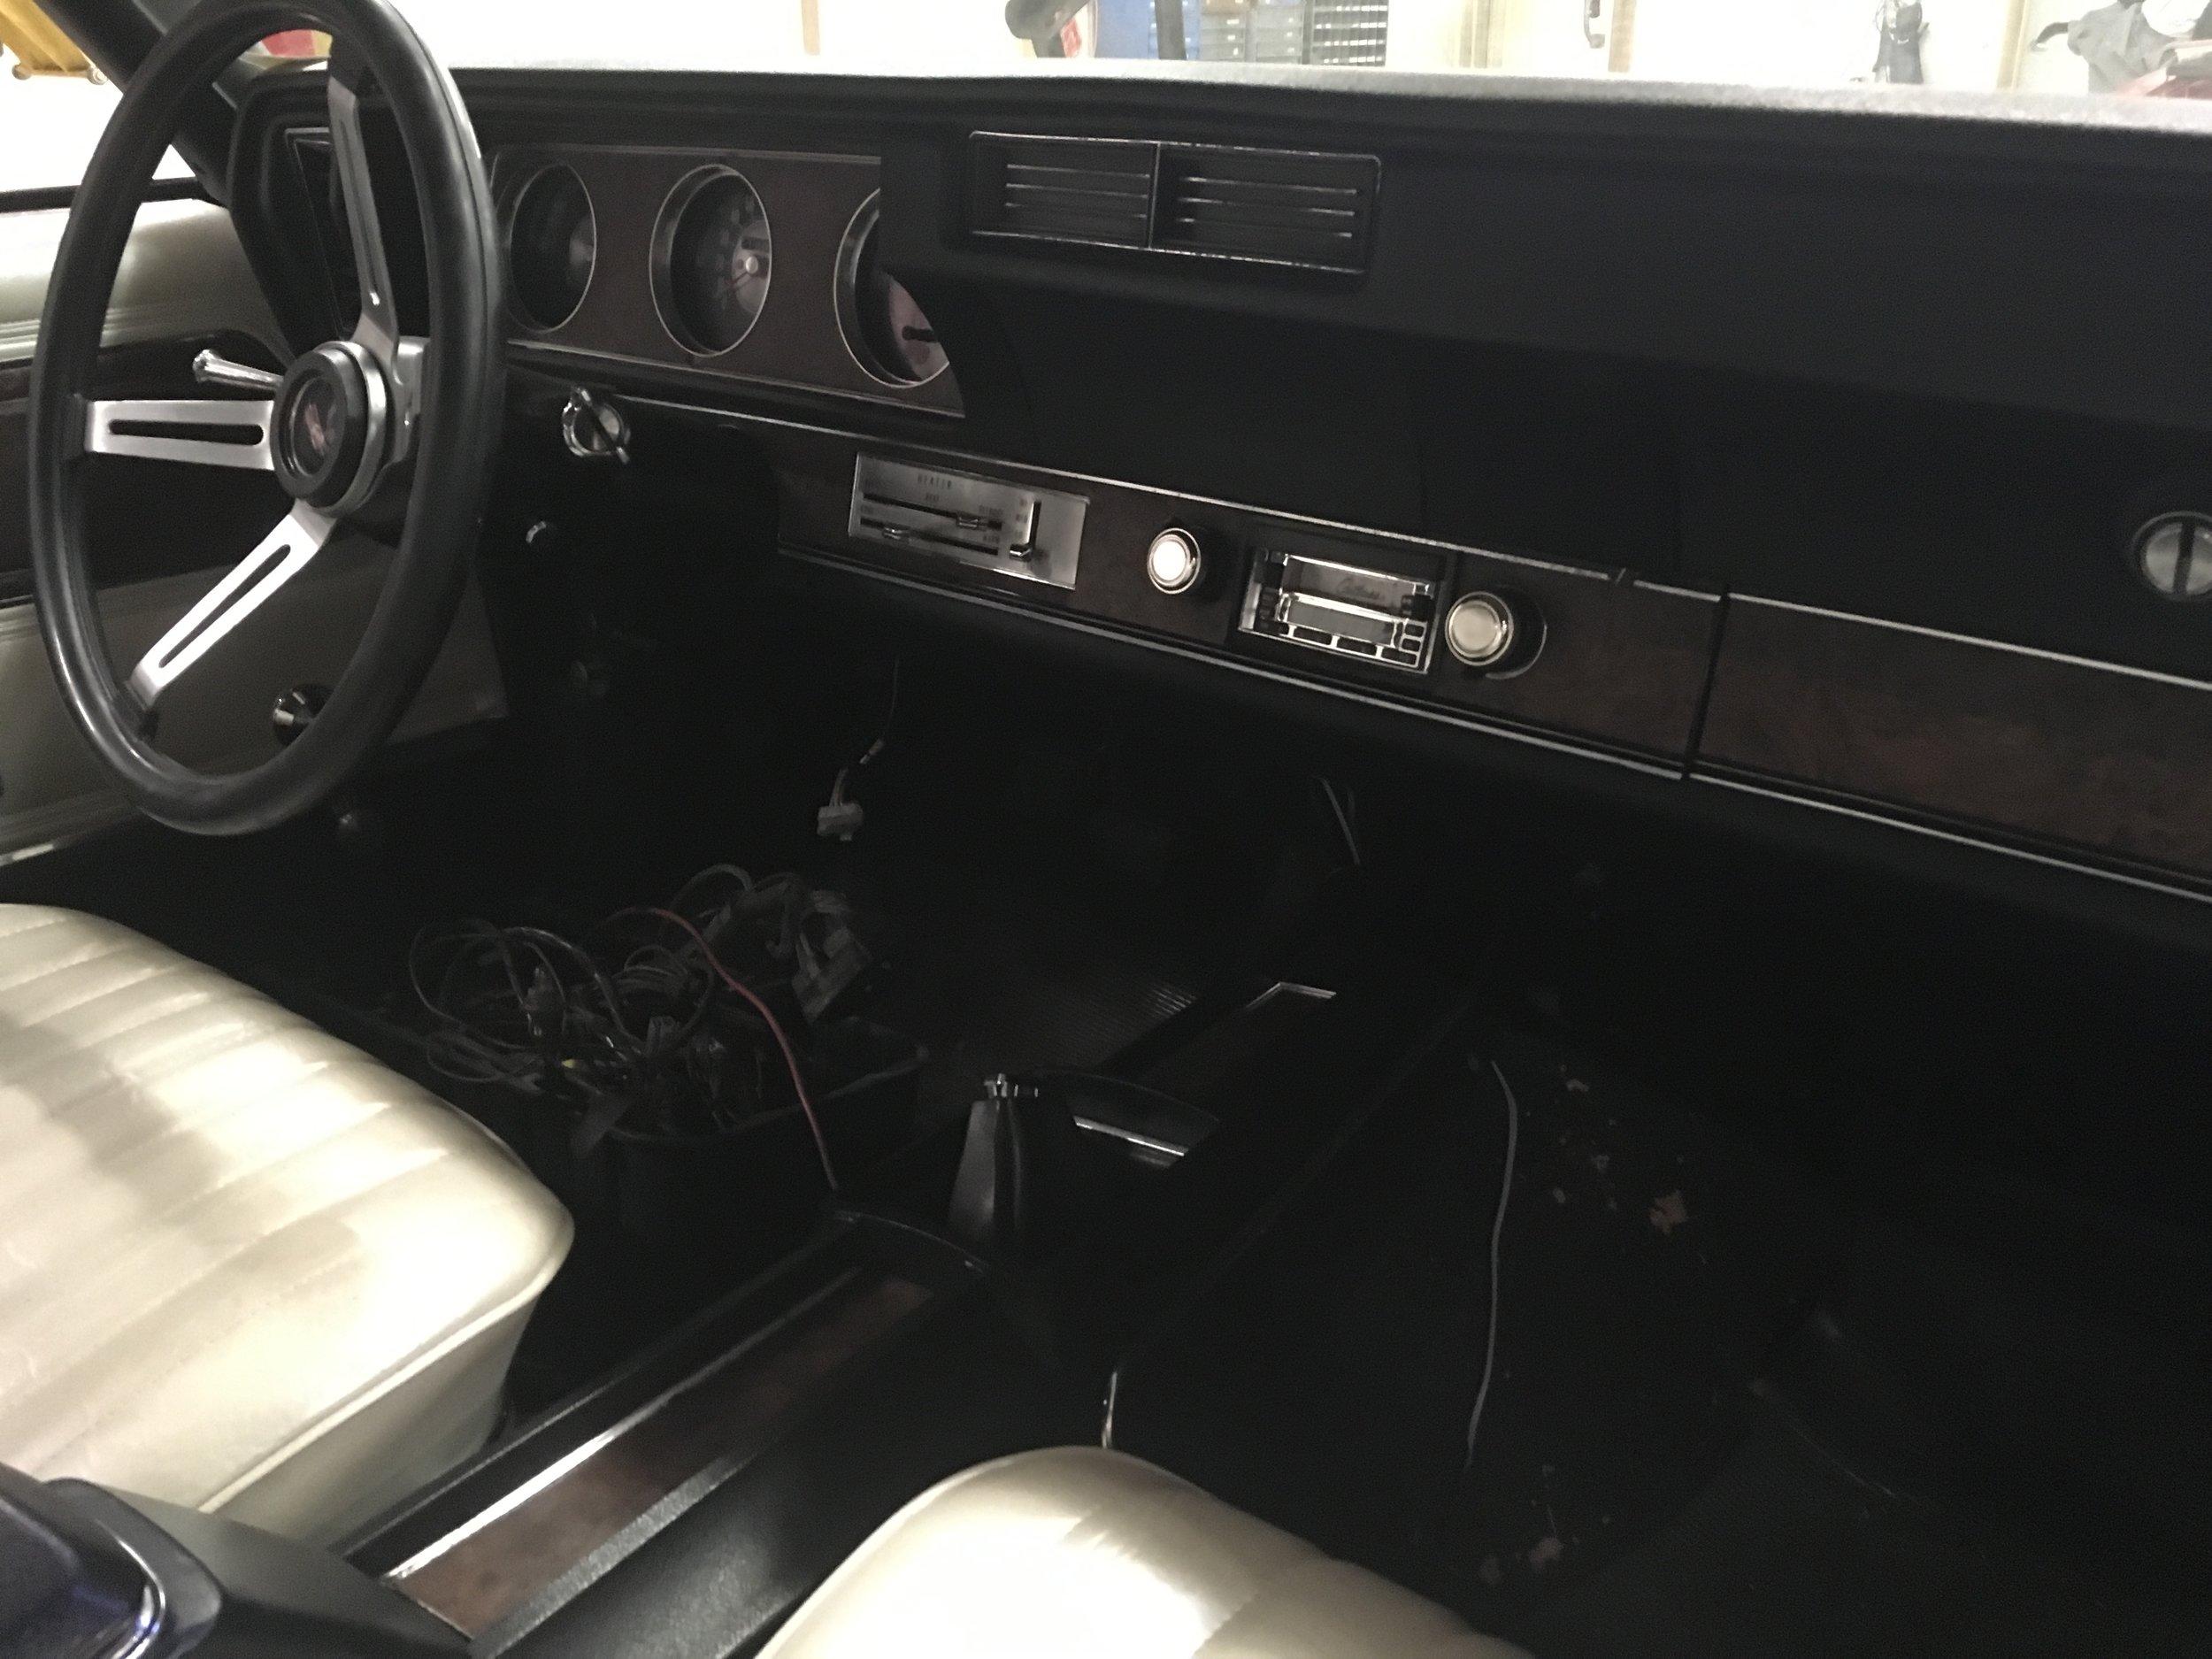 1970-oldsmobile-cutlass-minneapolis-custom-hot-rod-car-restoration-20.jpg